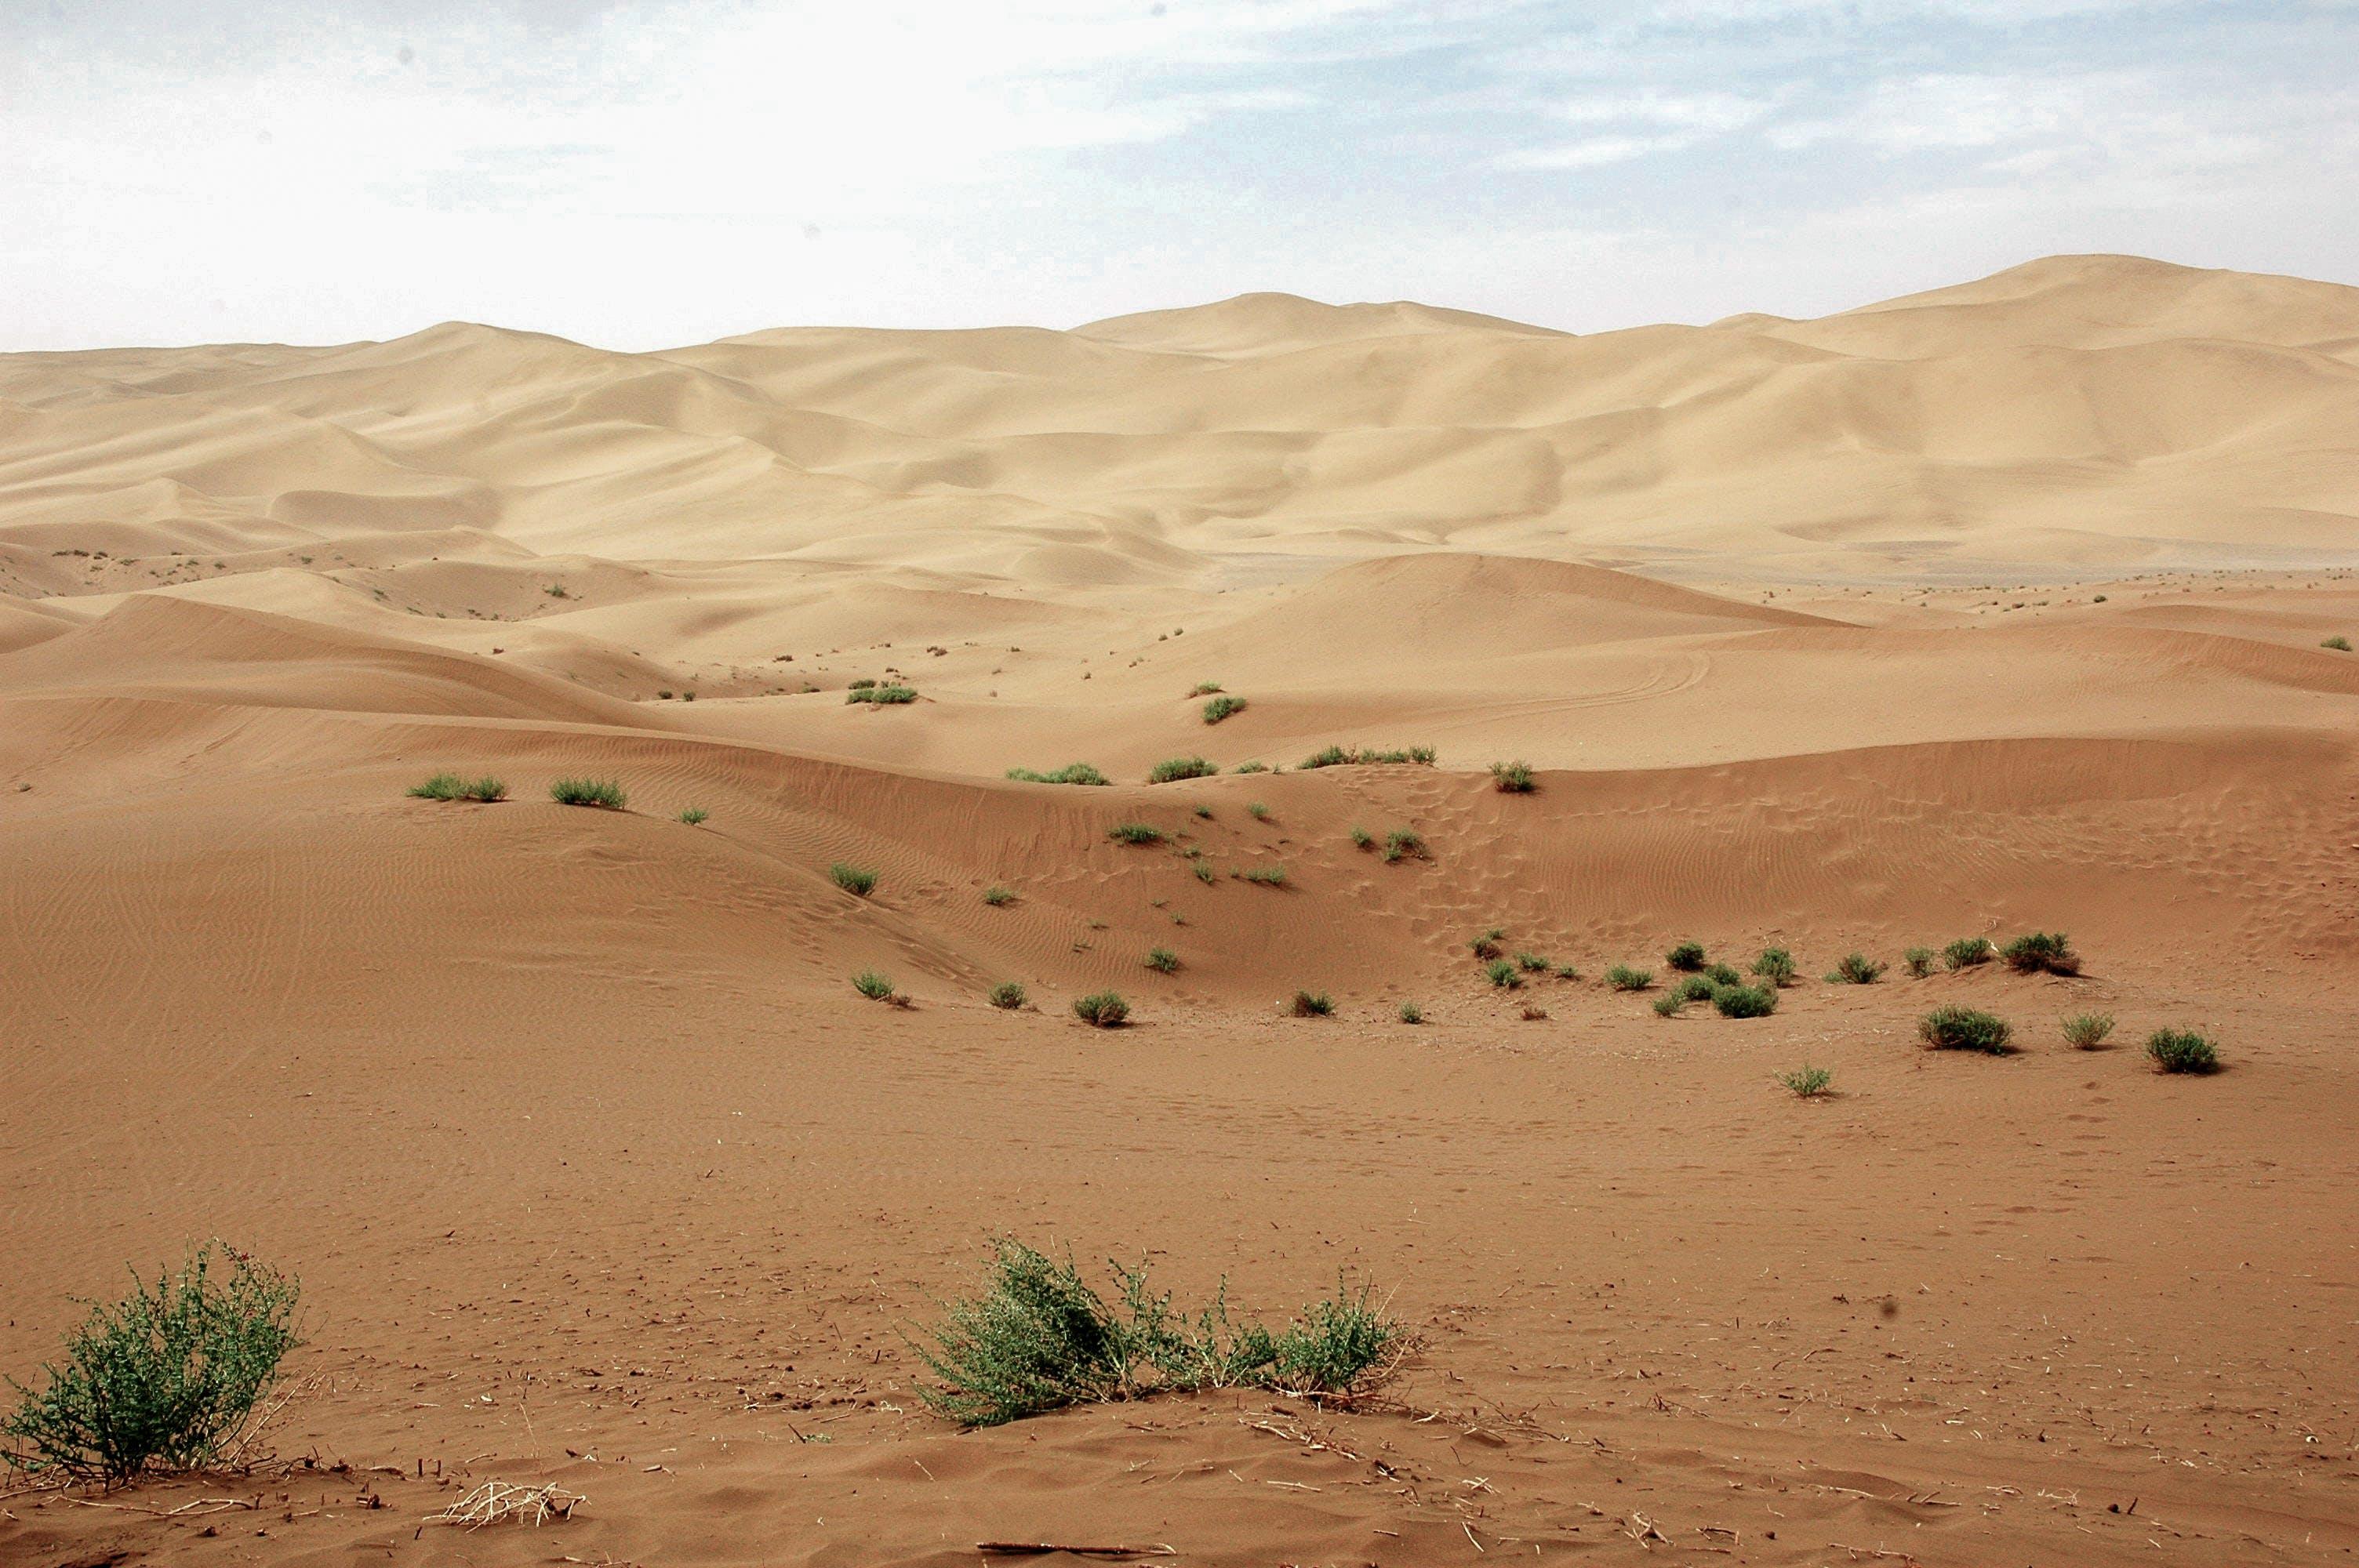 Free stock photo of desert, dunes, sand, sand dunes